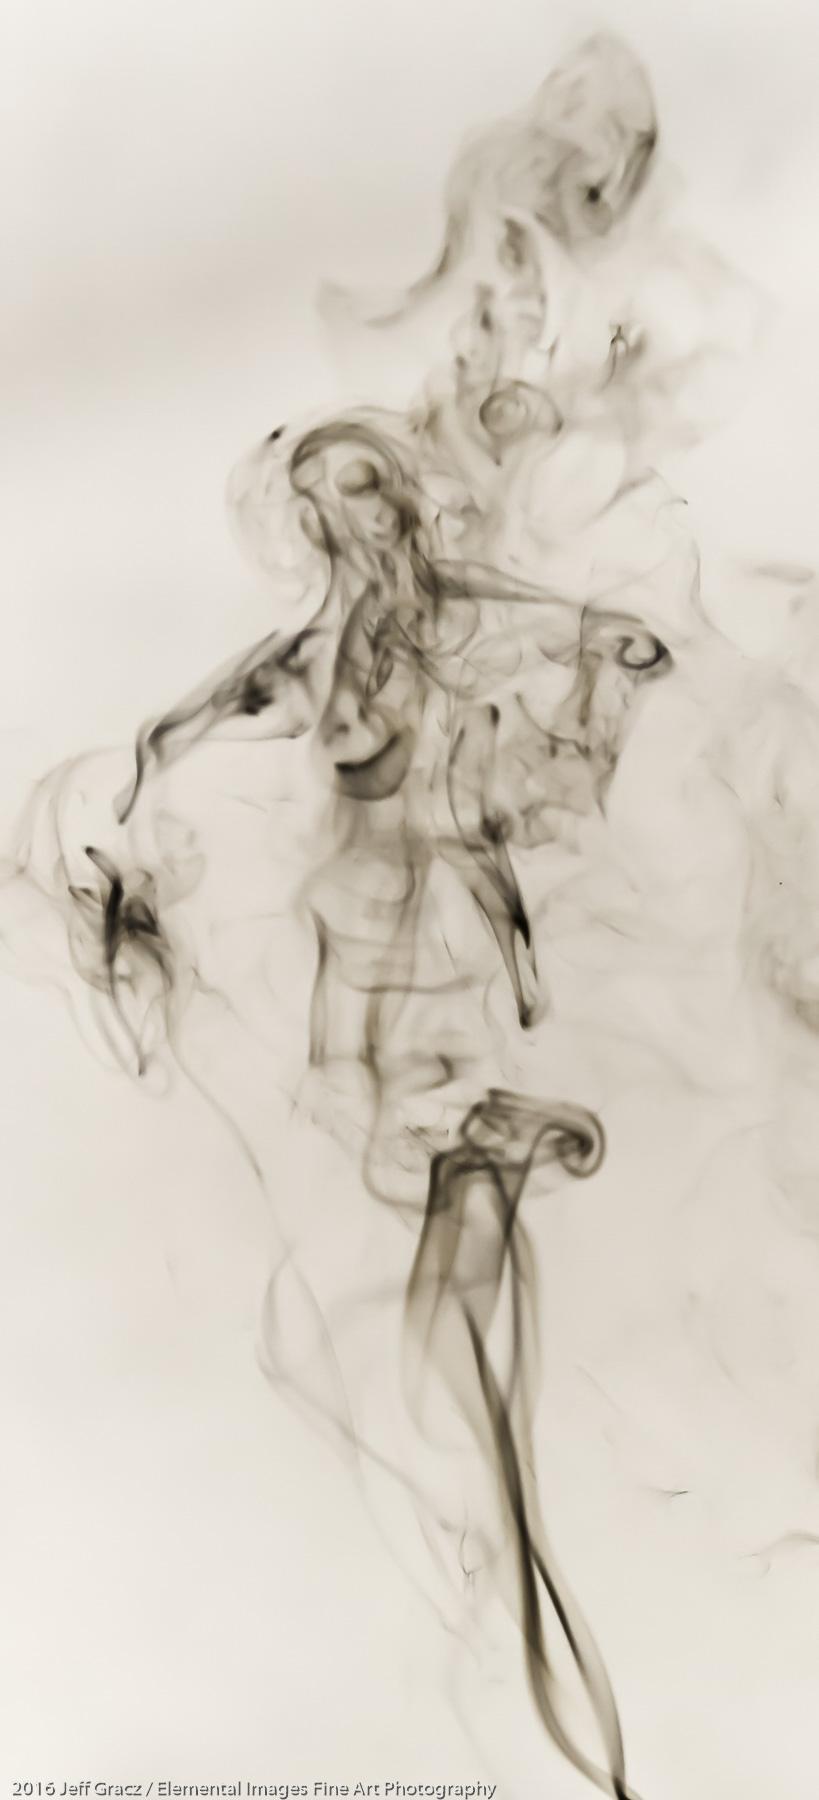 Smoke 22 | Vancouver | WA | USA - © 2016 Jeff Gracz / Elemental Images Fine Art Photography - All Rights Reserved Worldwide